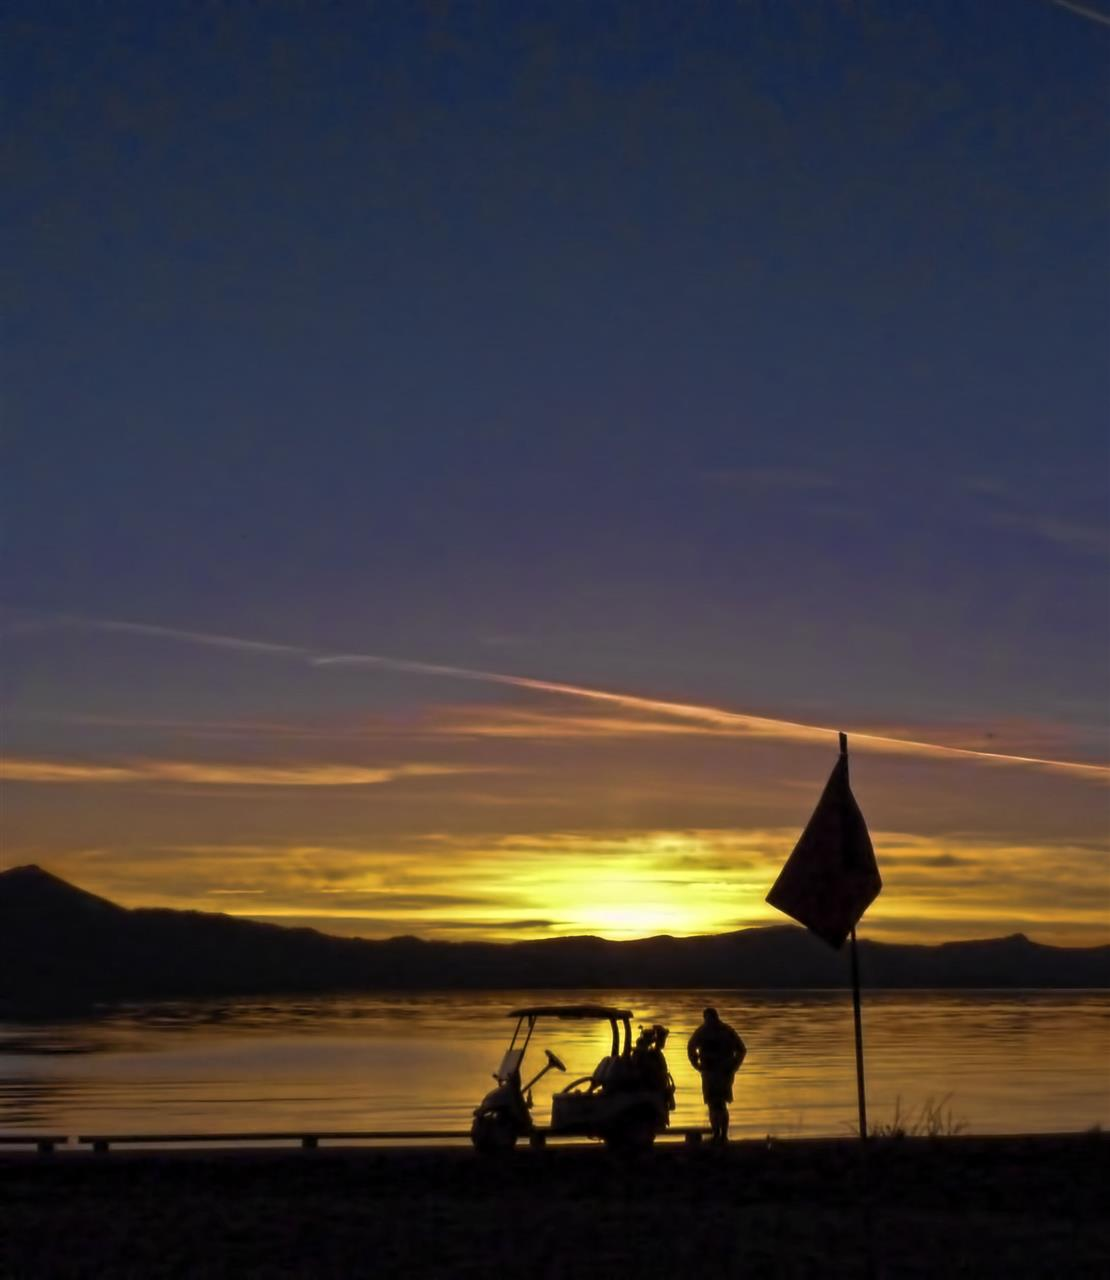 Edgewood Golf Course Stateline, Nevada Lake Tahoe